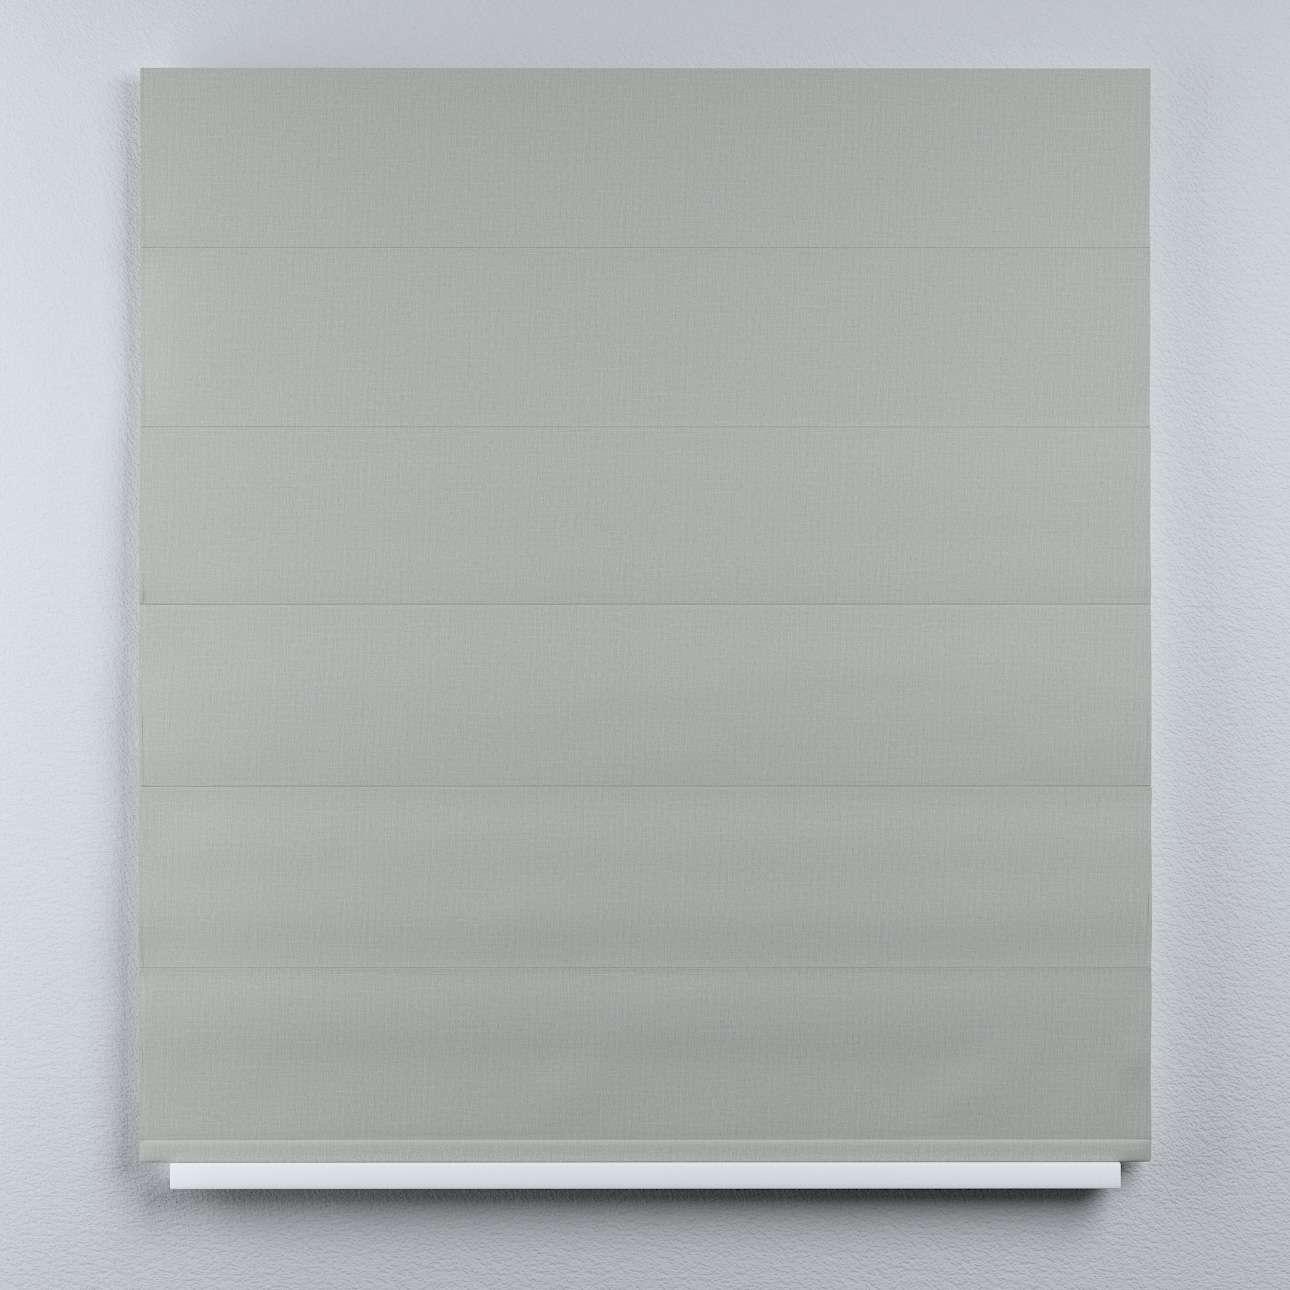 DUO Rímska roleta V kolekcii Blackout 280 cm, tkanina: 269-13